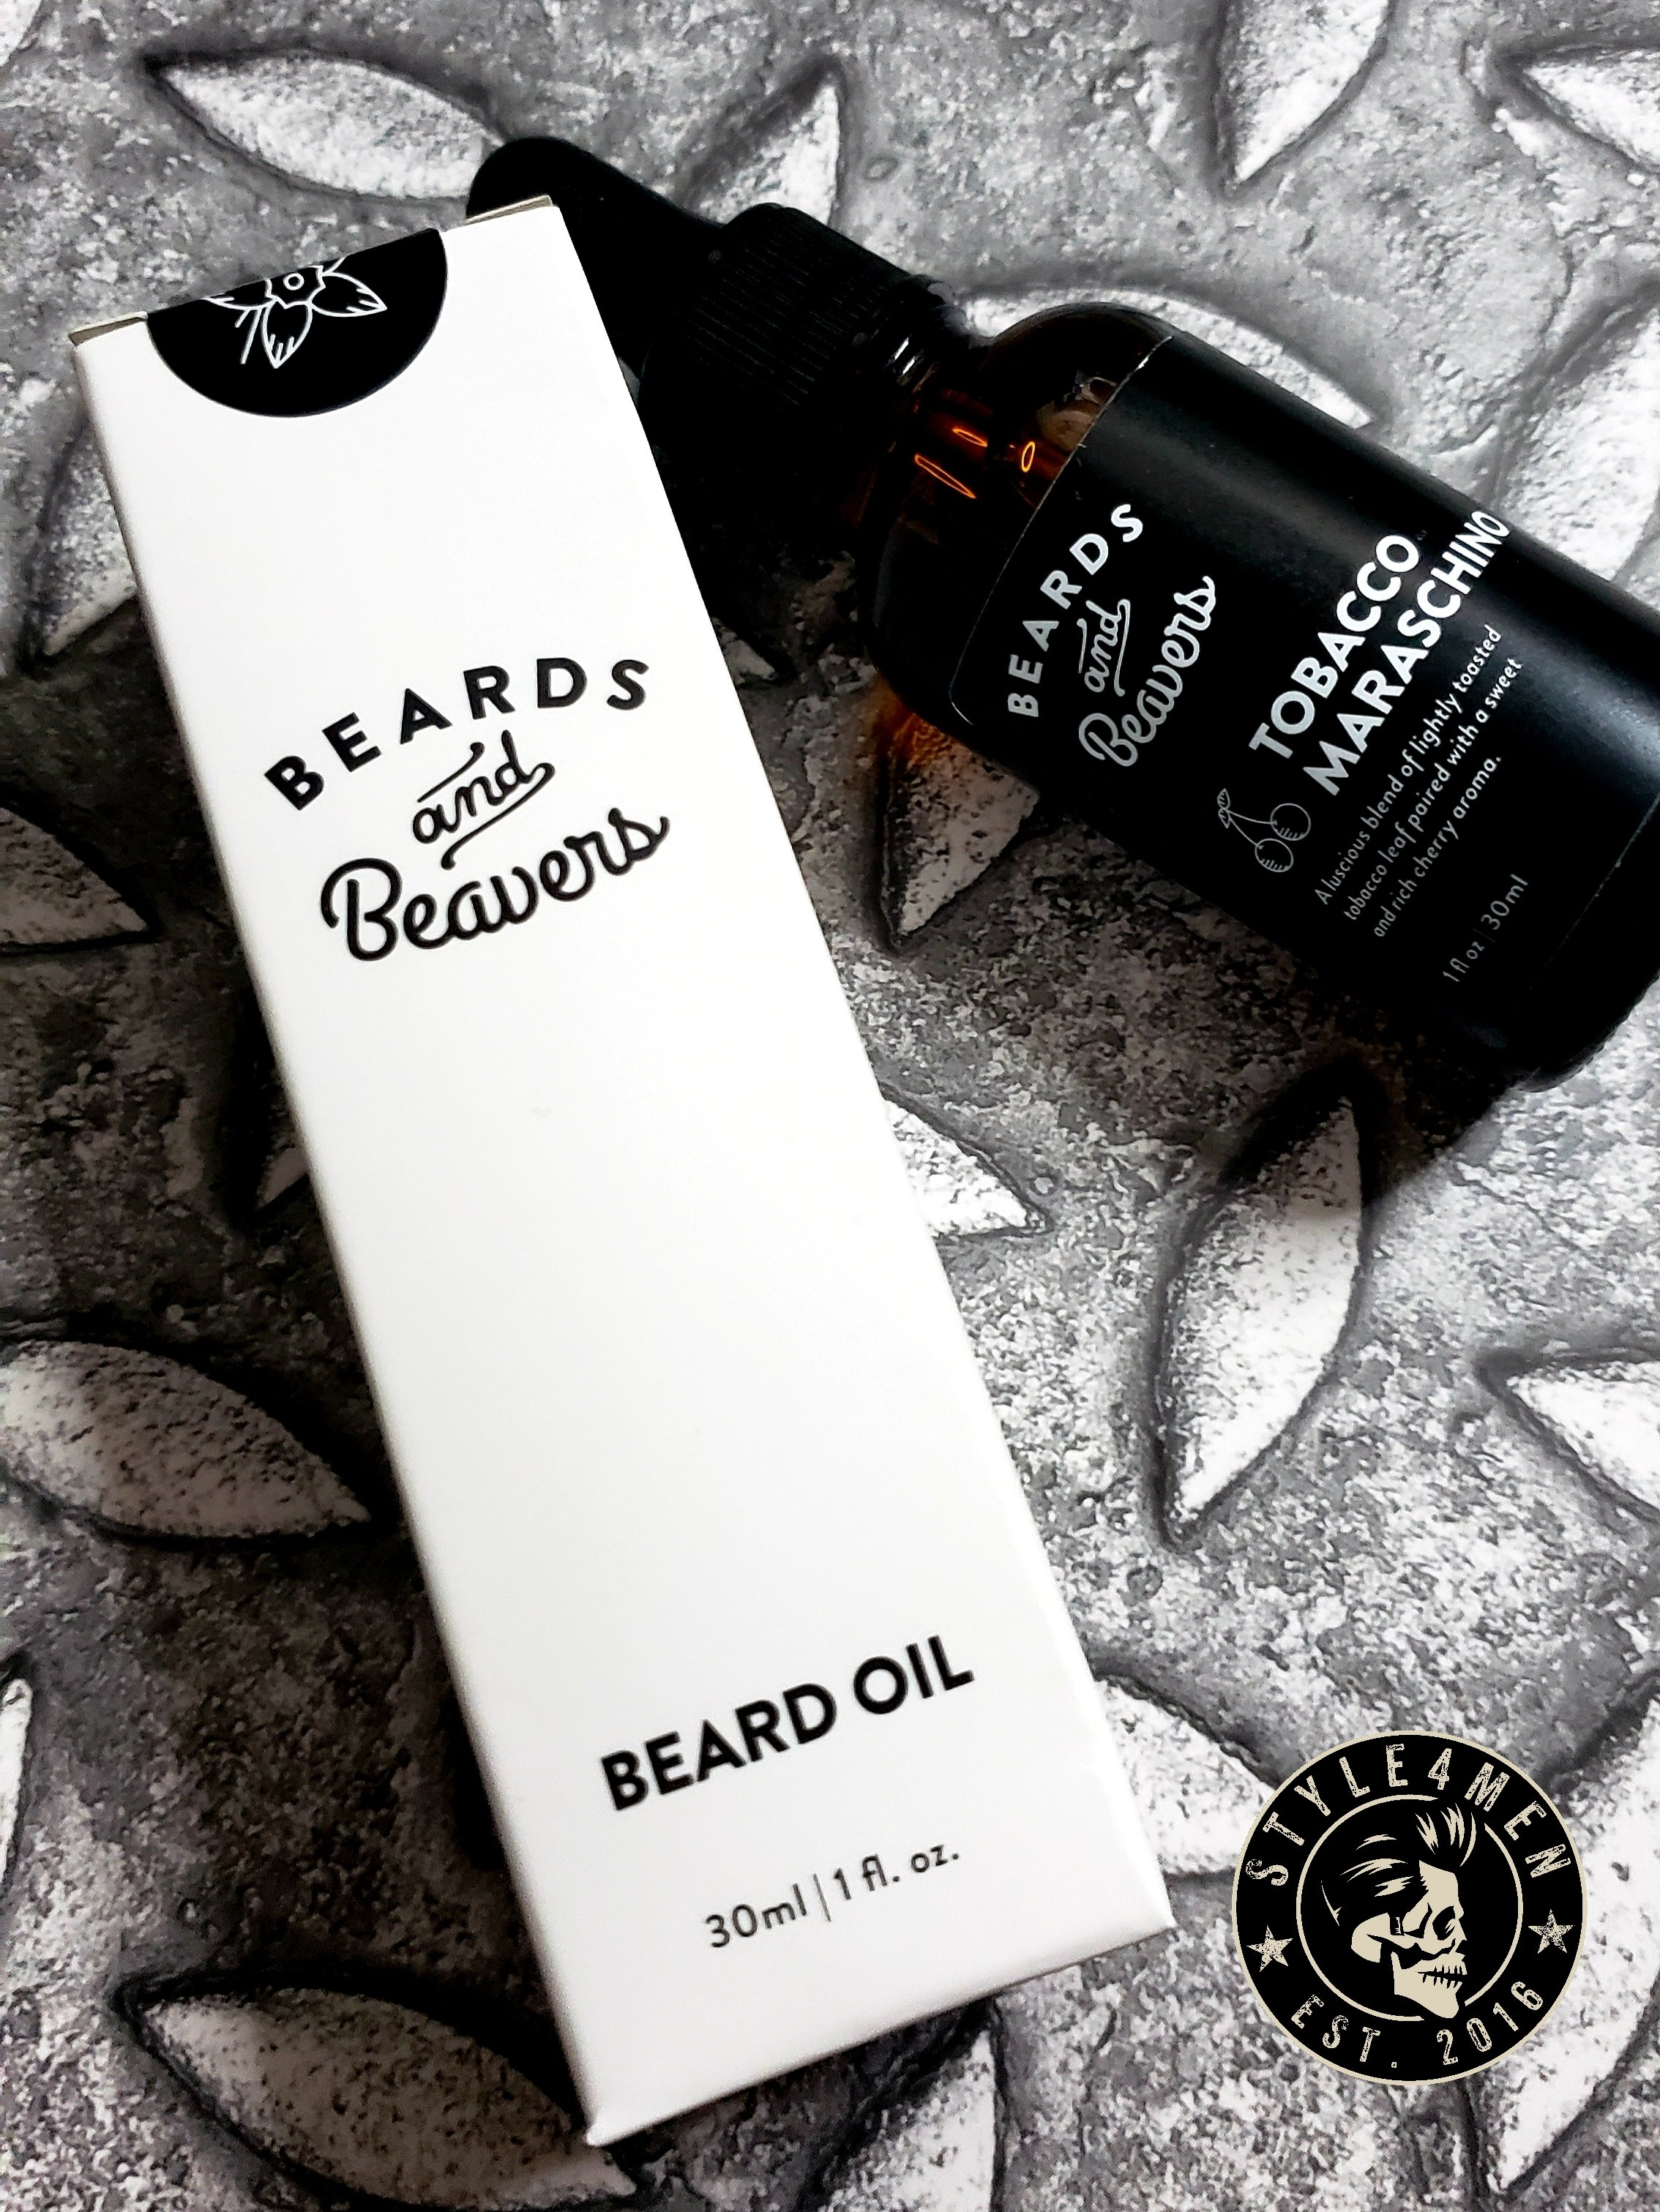 Beard oil by Beards and Beavers